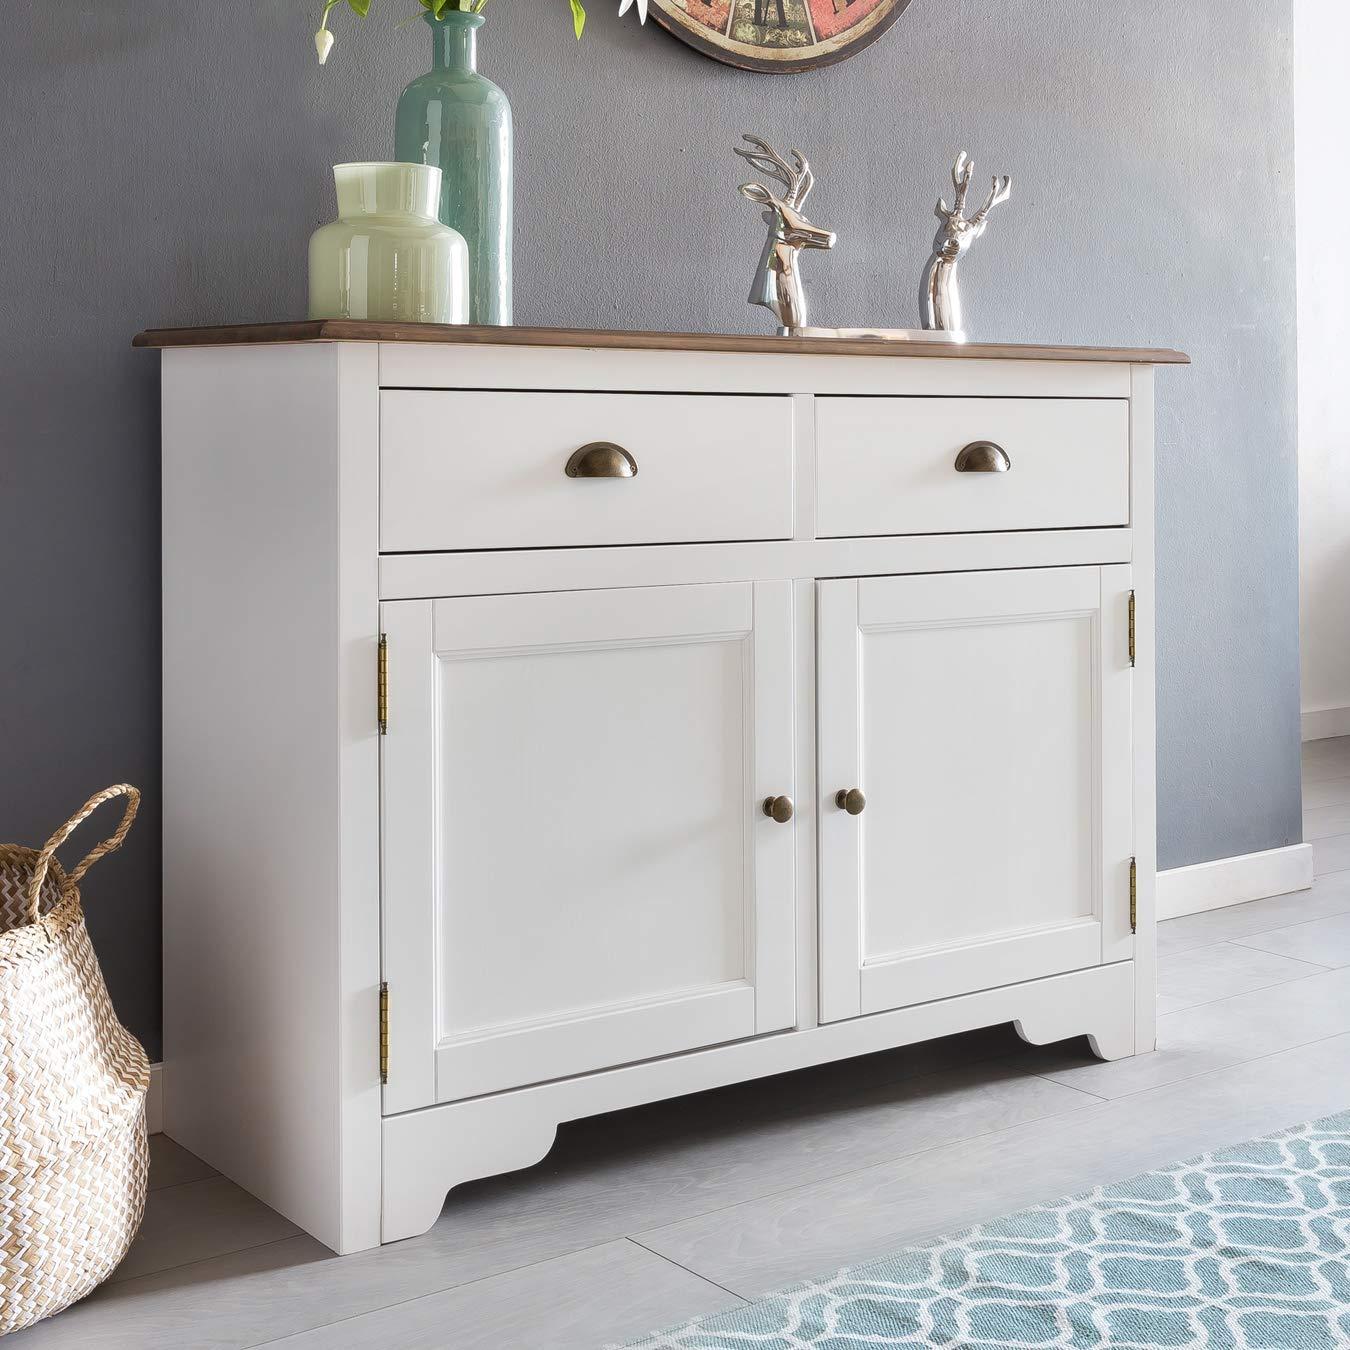 Wohnling Mayla Sideboard, Massivholz, Weiß, 110 x 85 x 45 cm 1